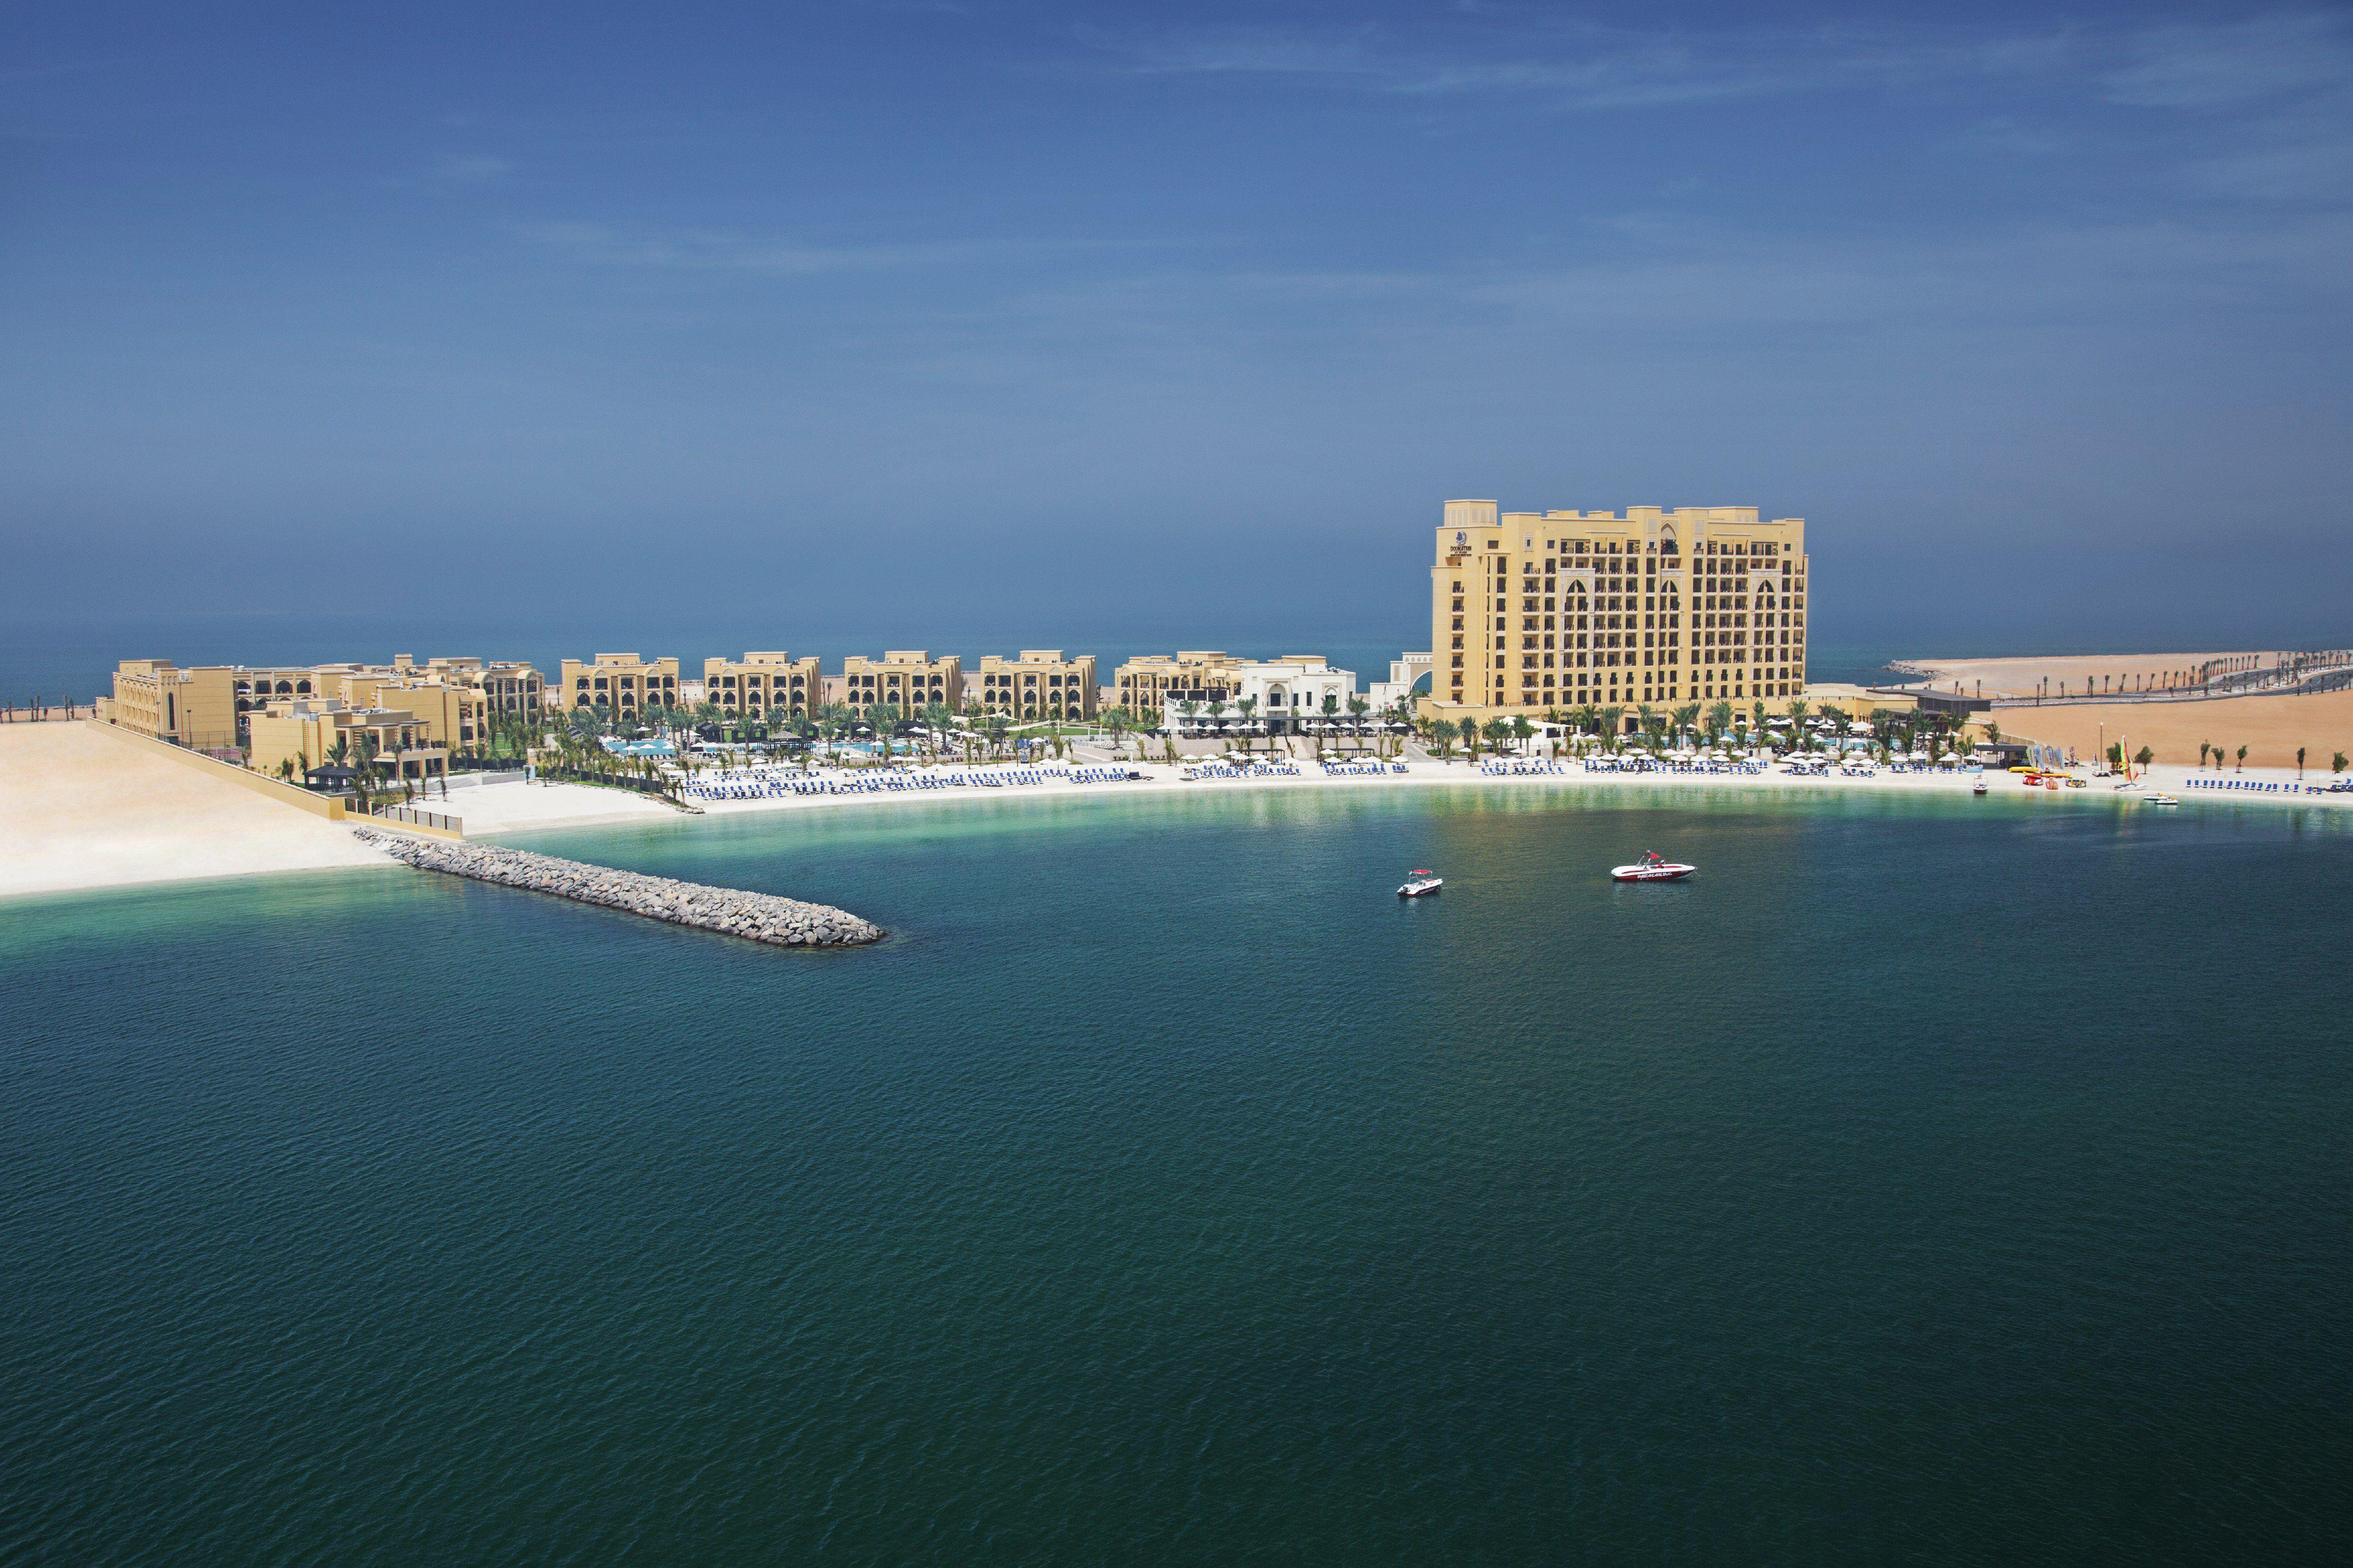 Pin by PropertyTrader on Dubai   Resort spa, Ras al khaimah